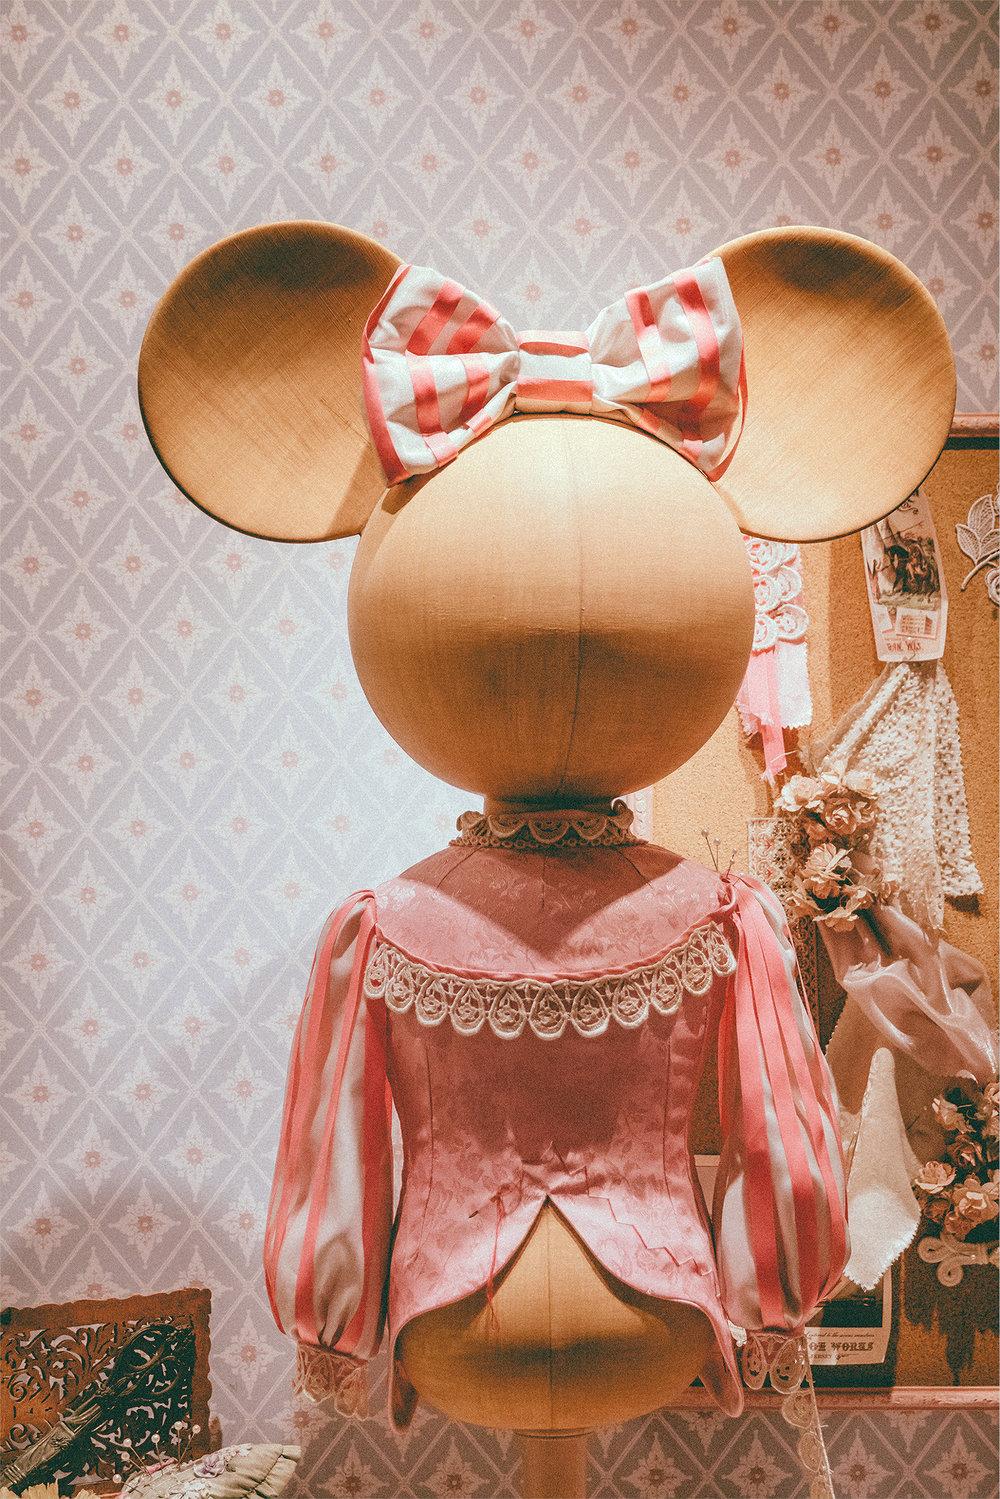 In World Bazaar, Minnie is a seamstress for Disney royalty.